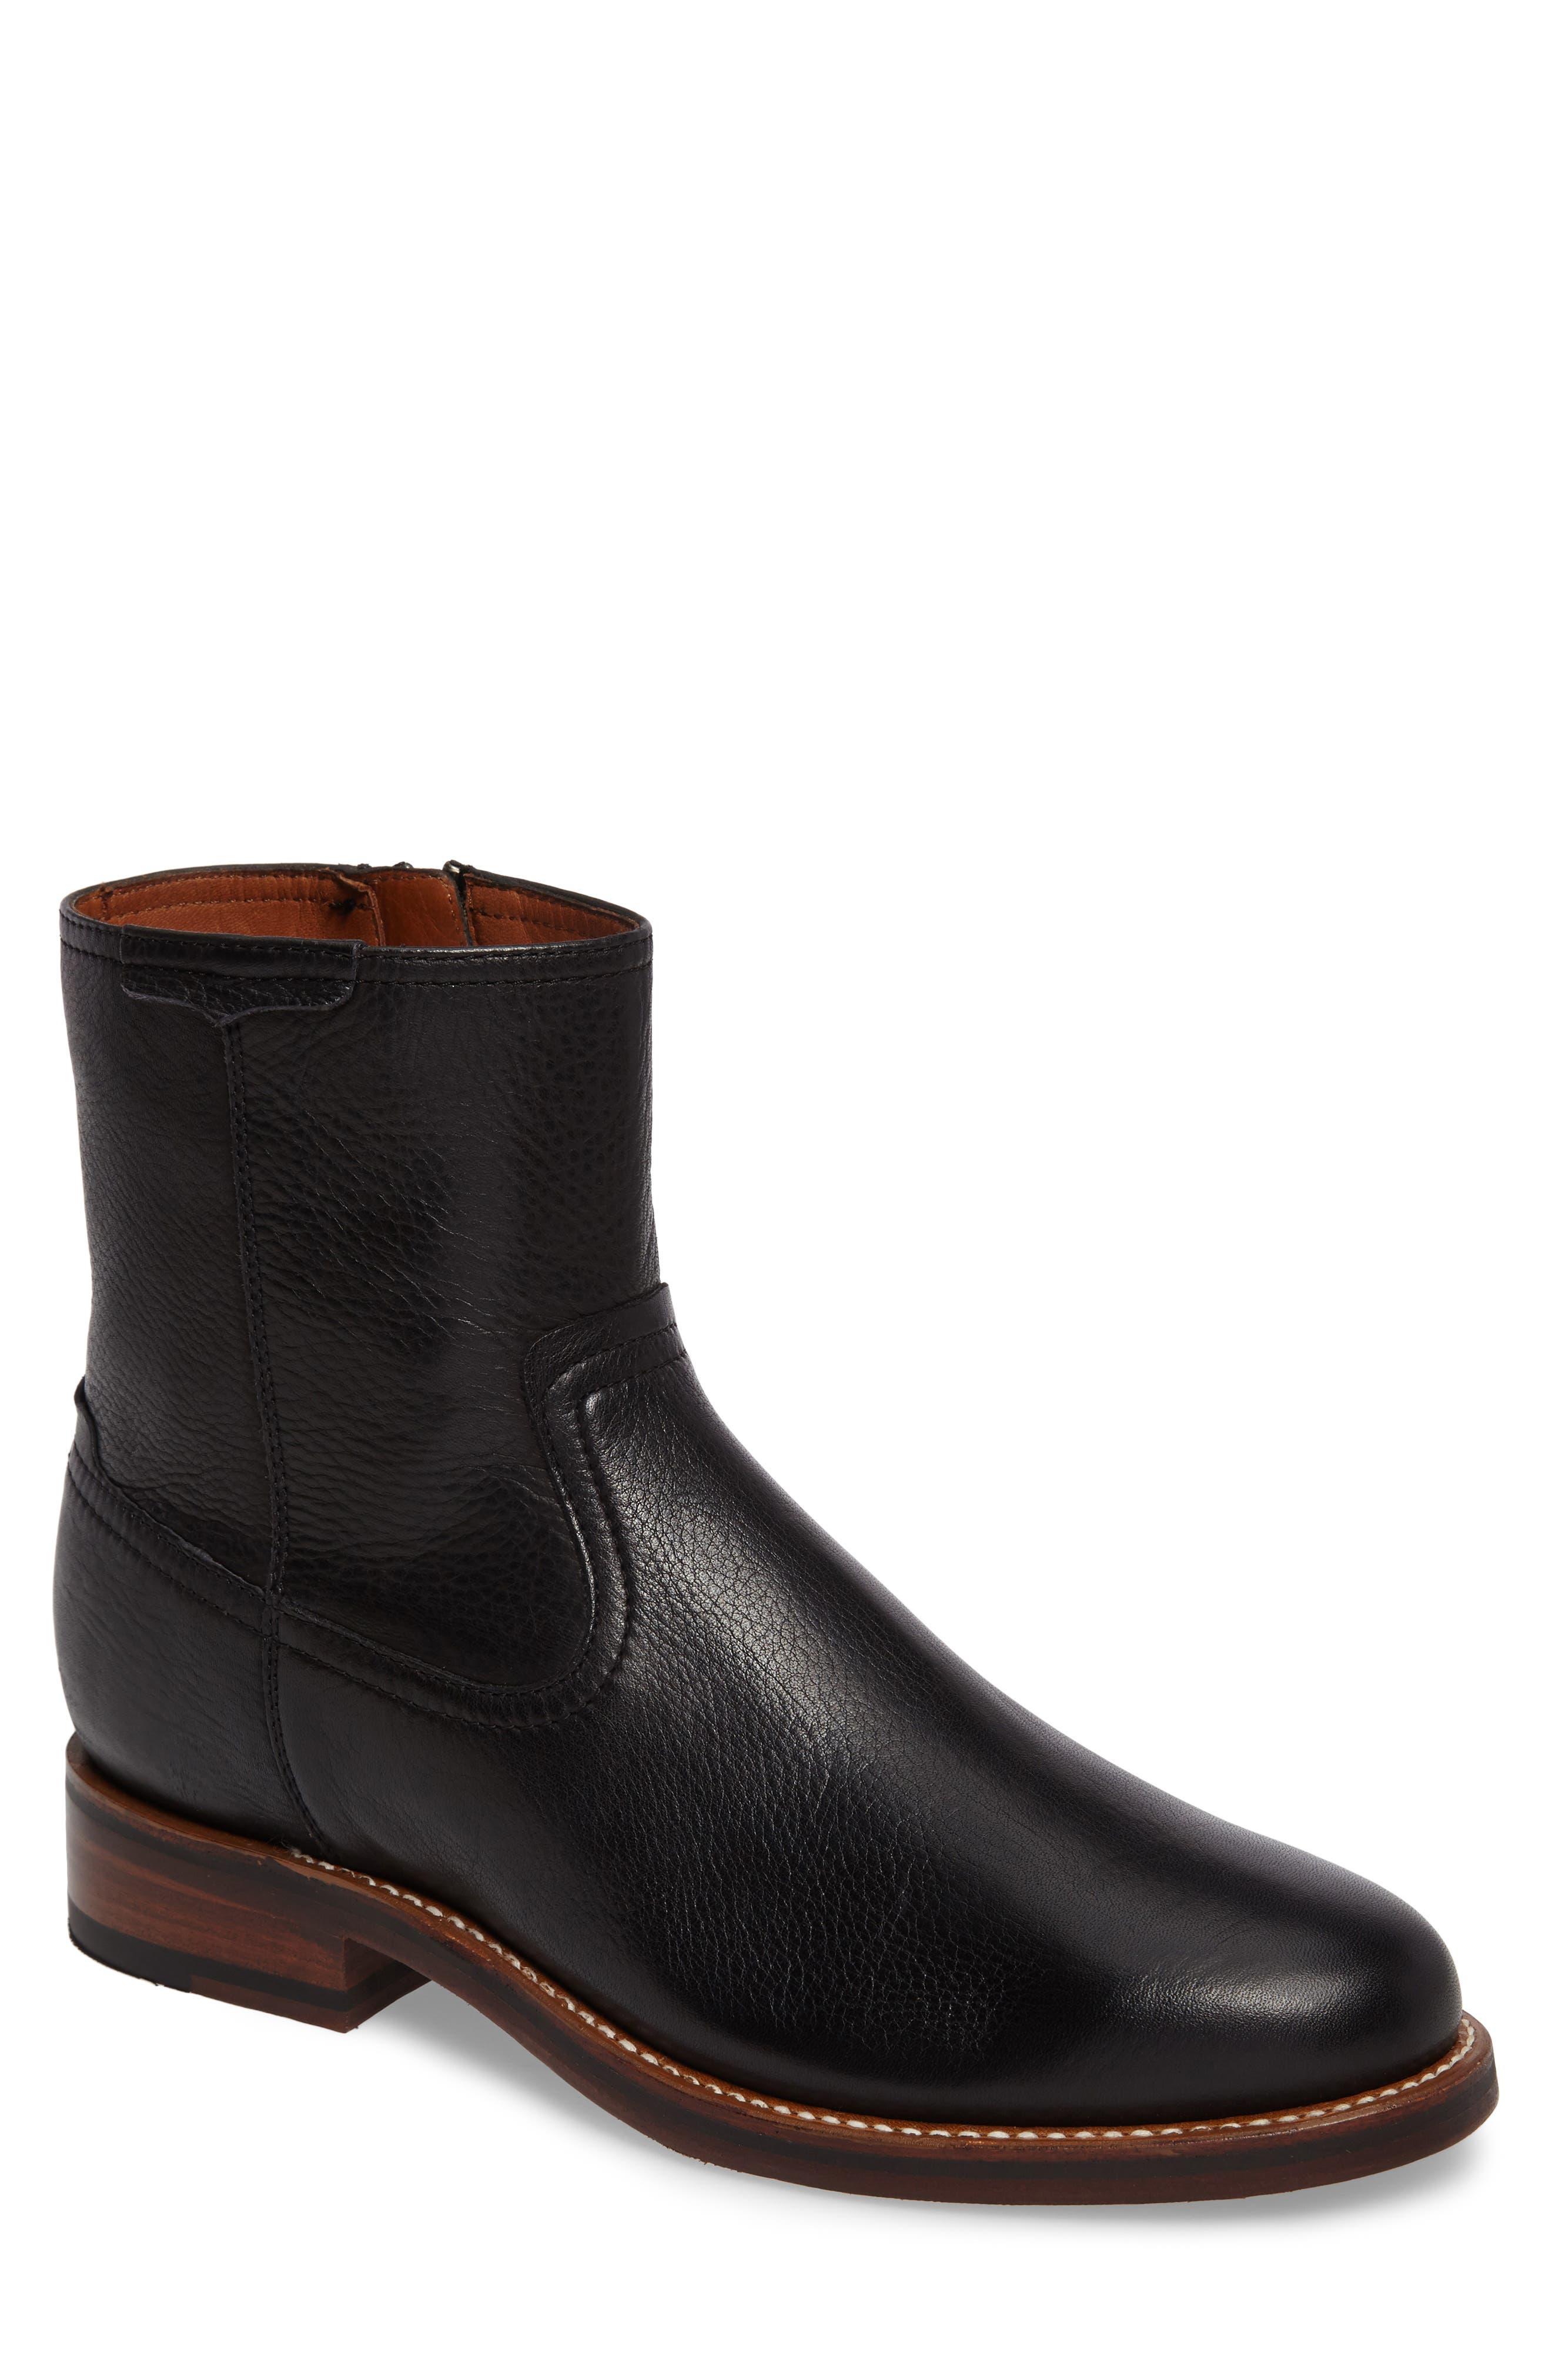 Ariat Santa Fe Mid Zip Boot,                         Main,                         color, 001